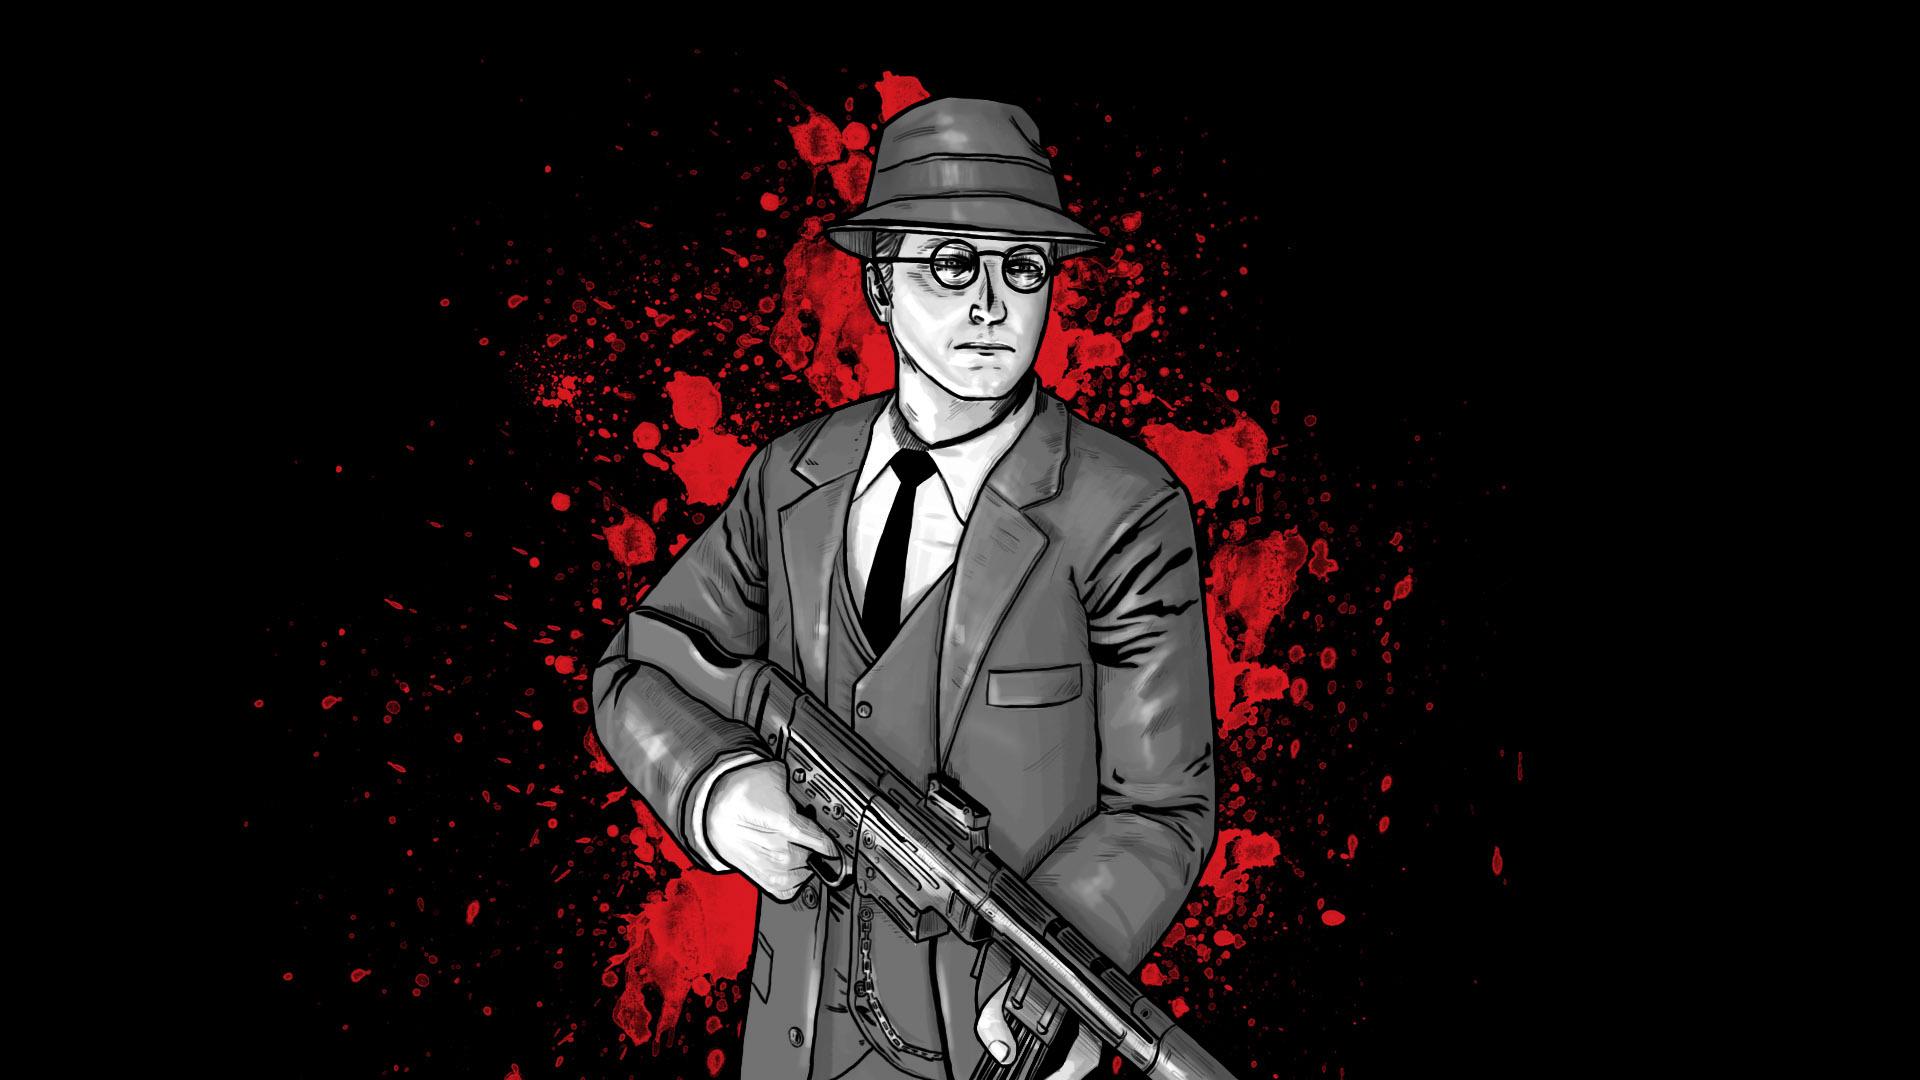 Sniper Elite Nazi Zombie Army Artwork 2.jpg